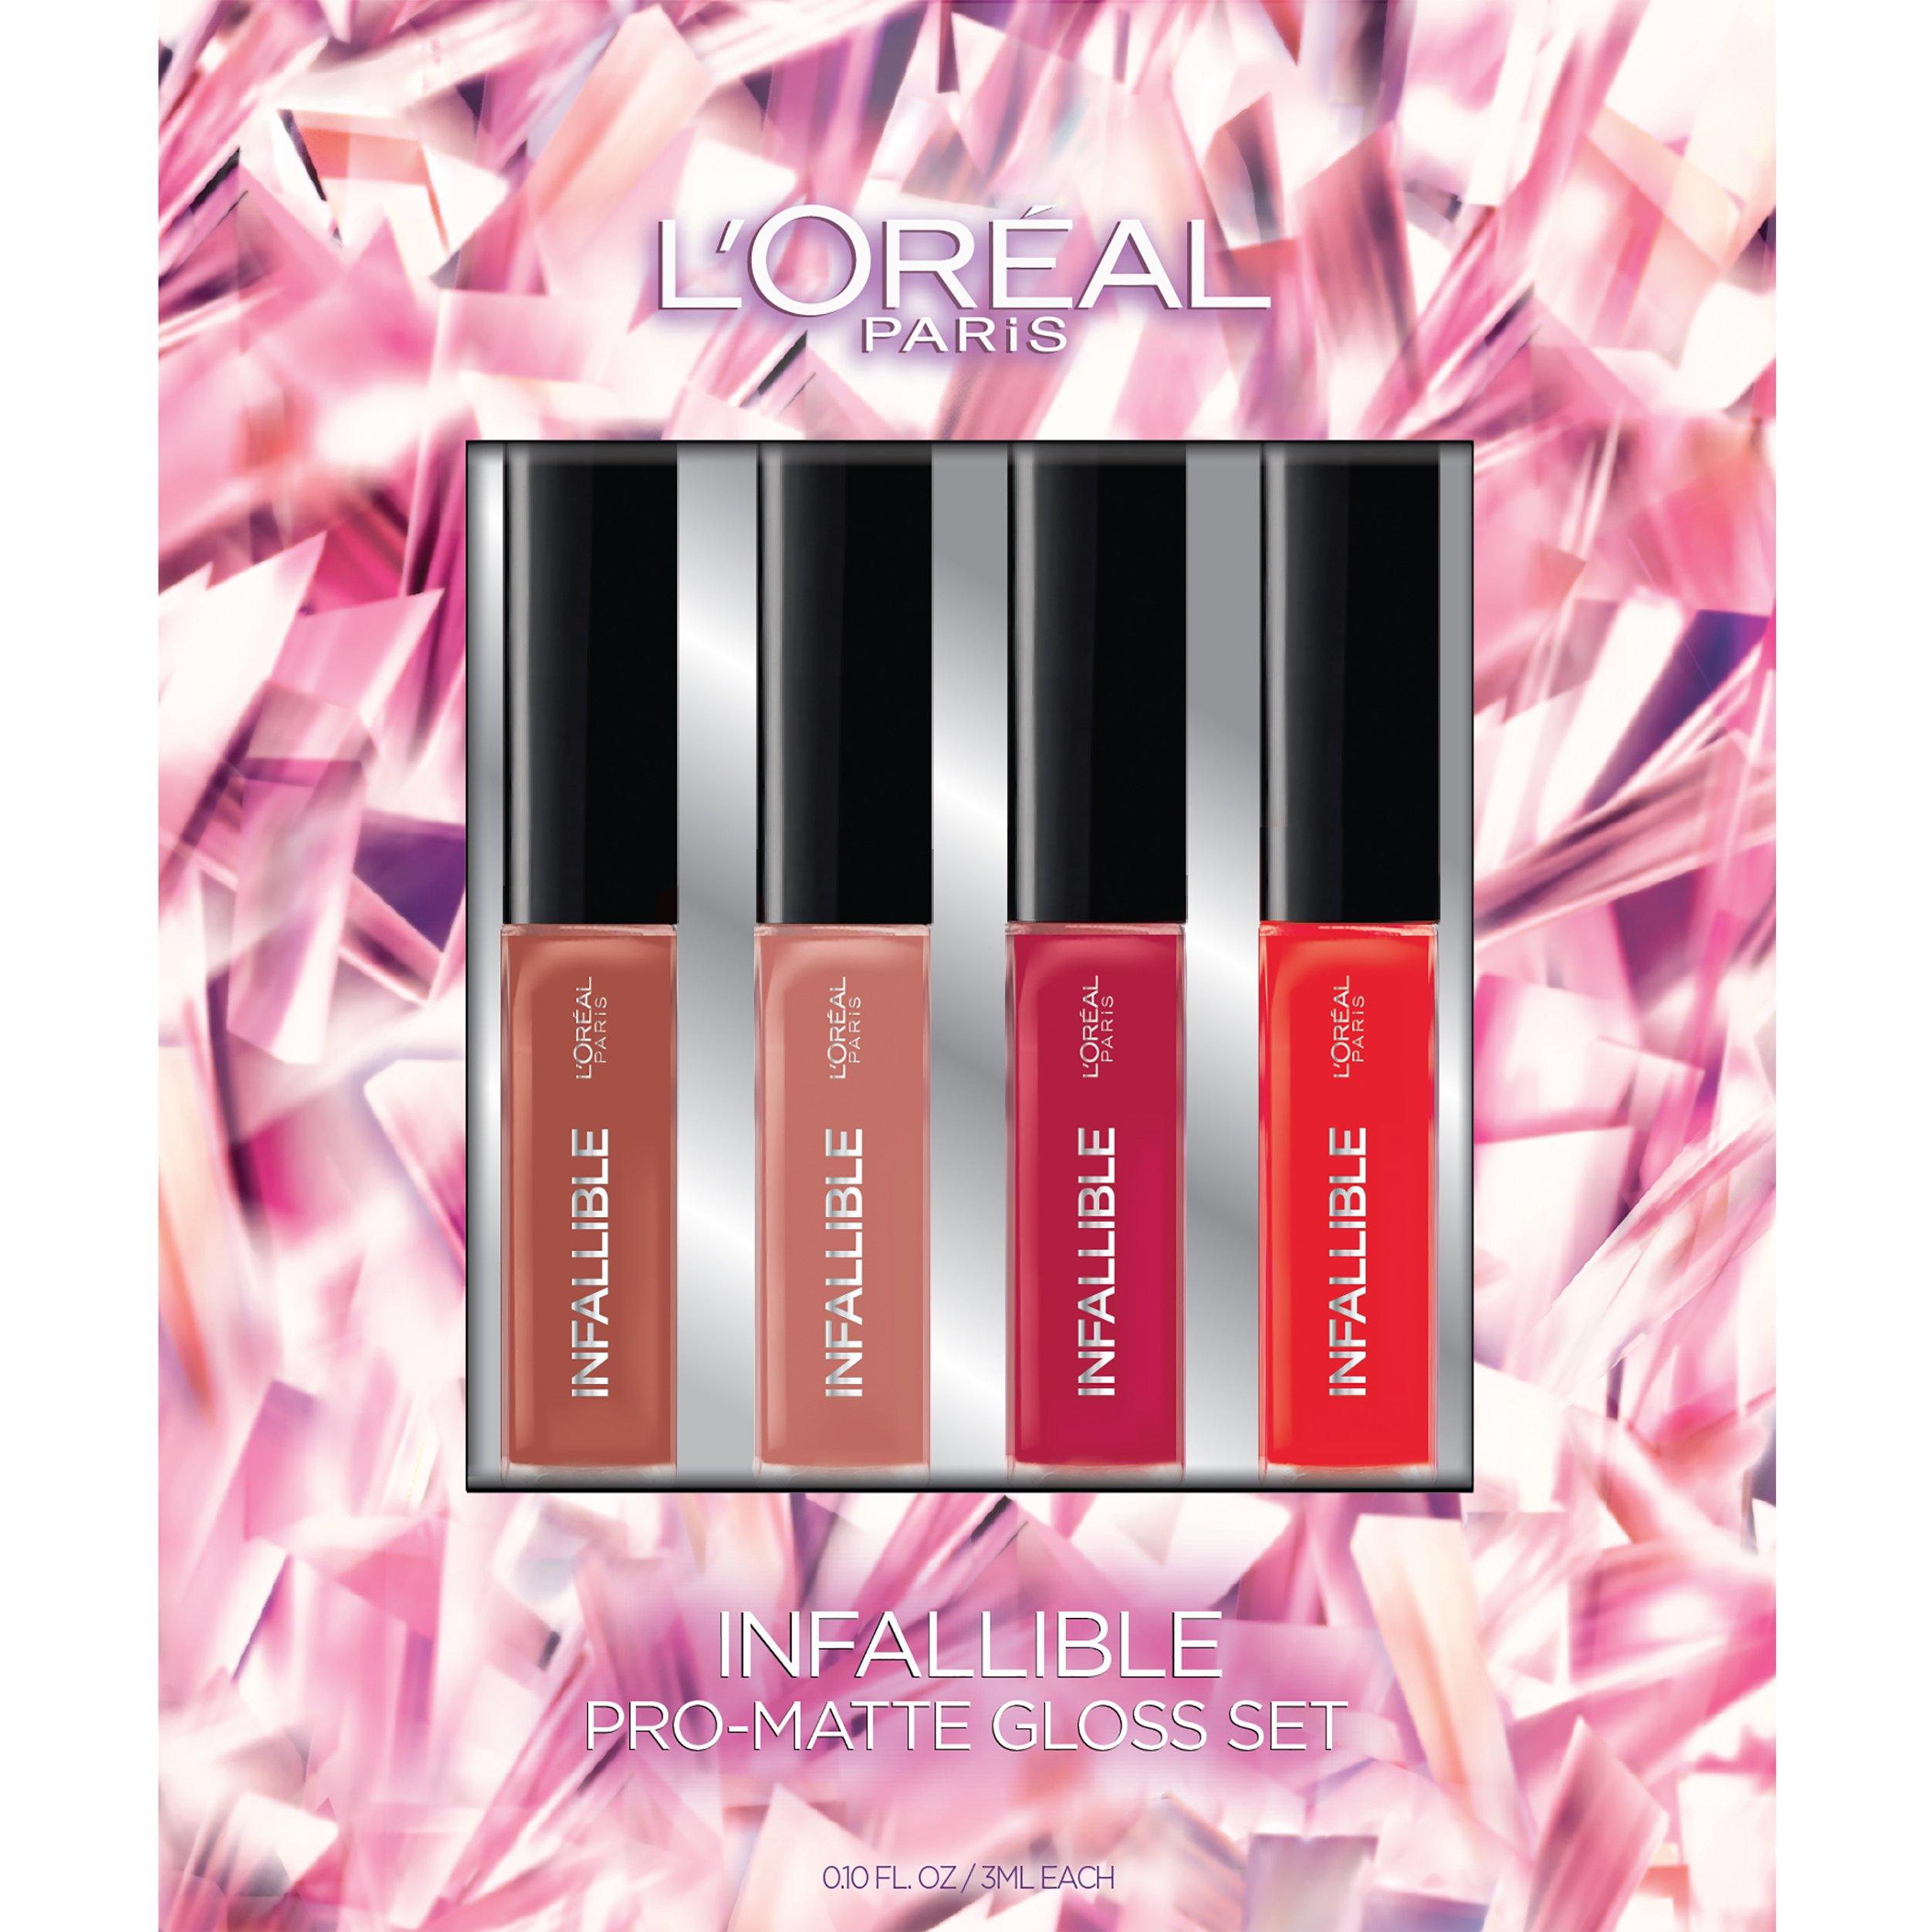 L'Oreal Paris Cosmetics Infallible Pro-Matte Lip Gloss Set by L'Oreal Paris (Image #1)